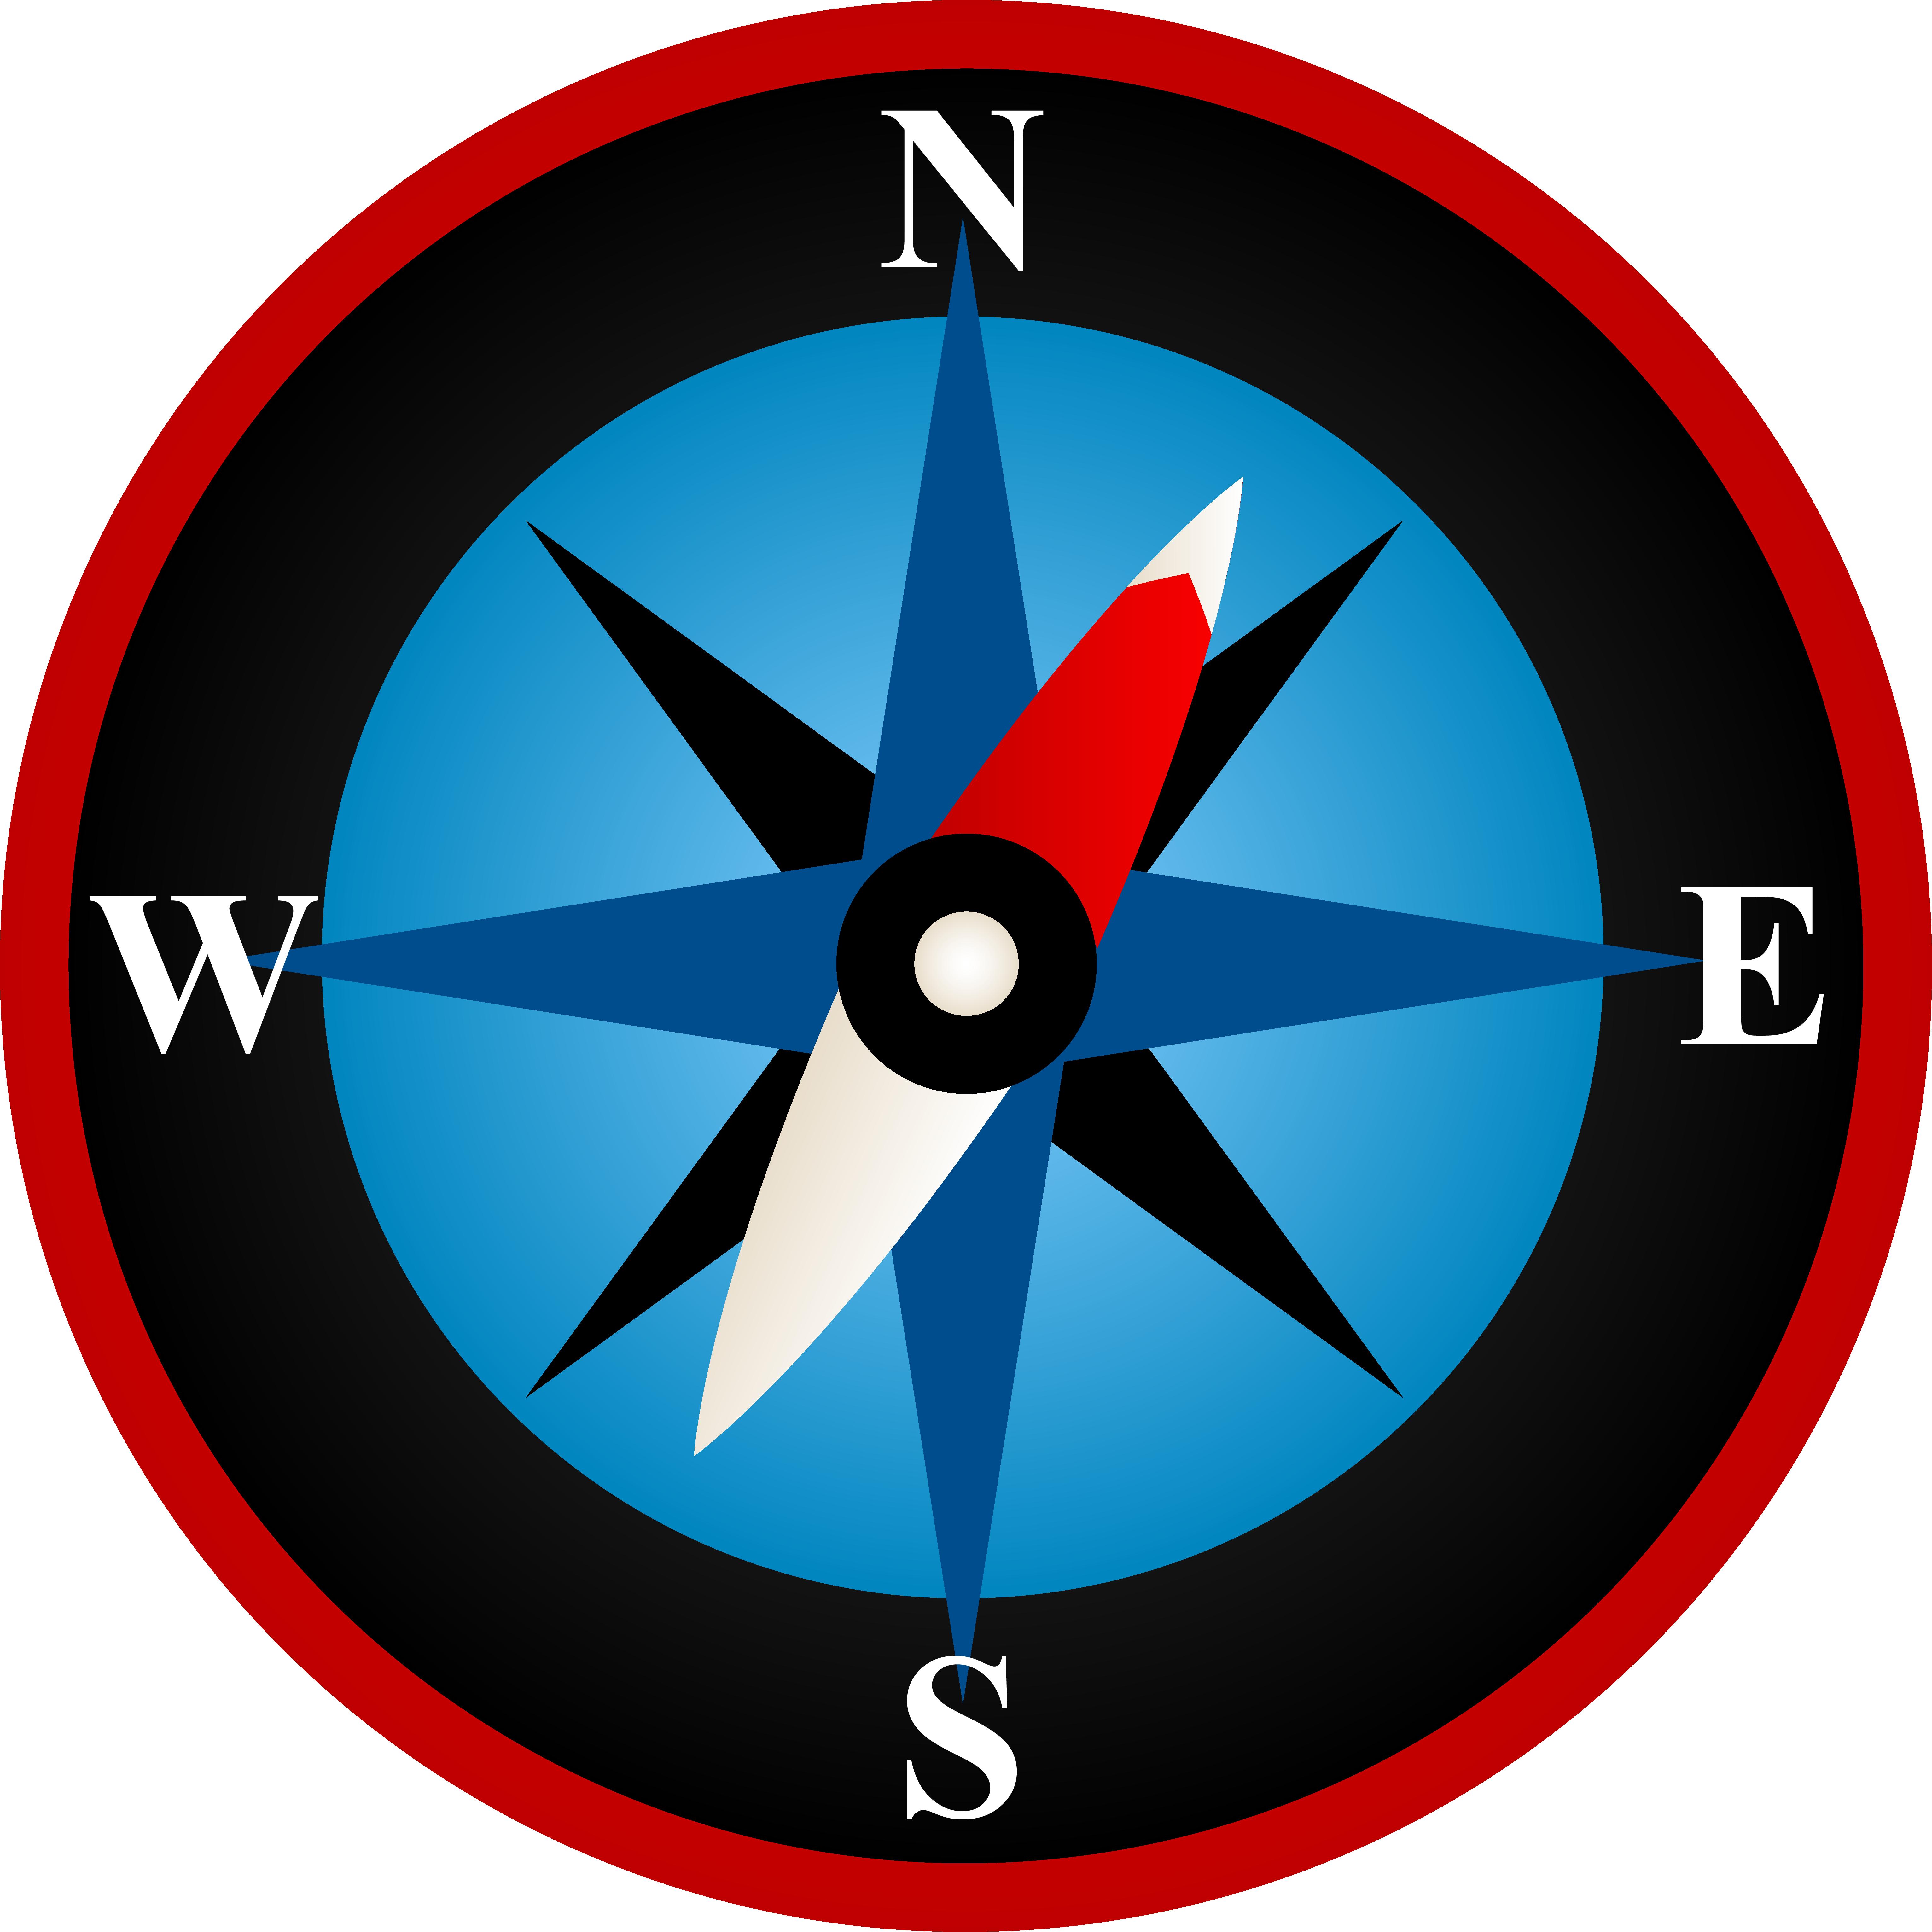 Compass cliparts